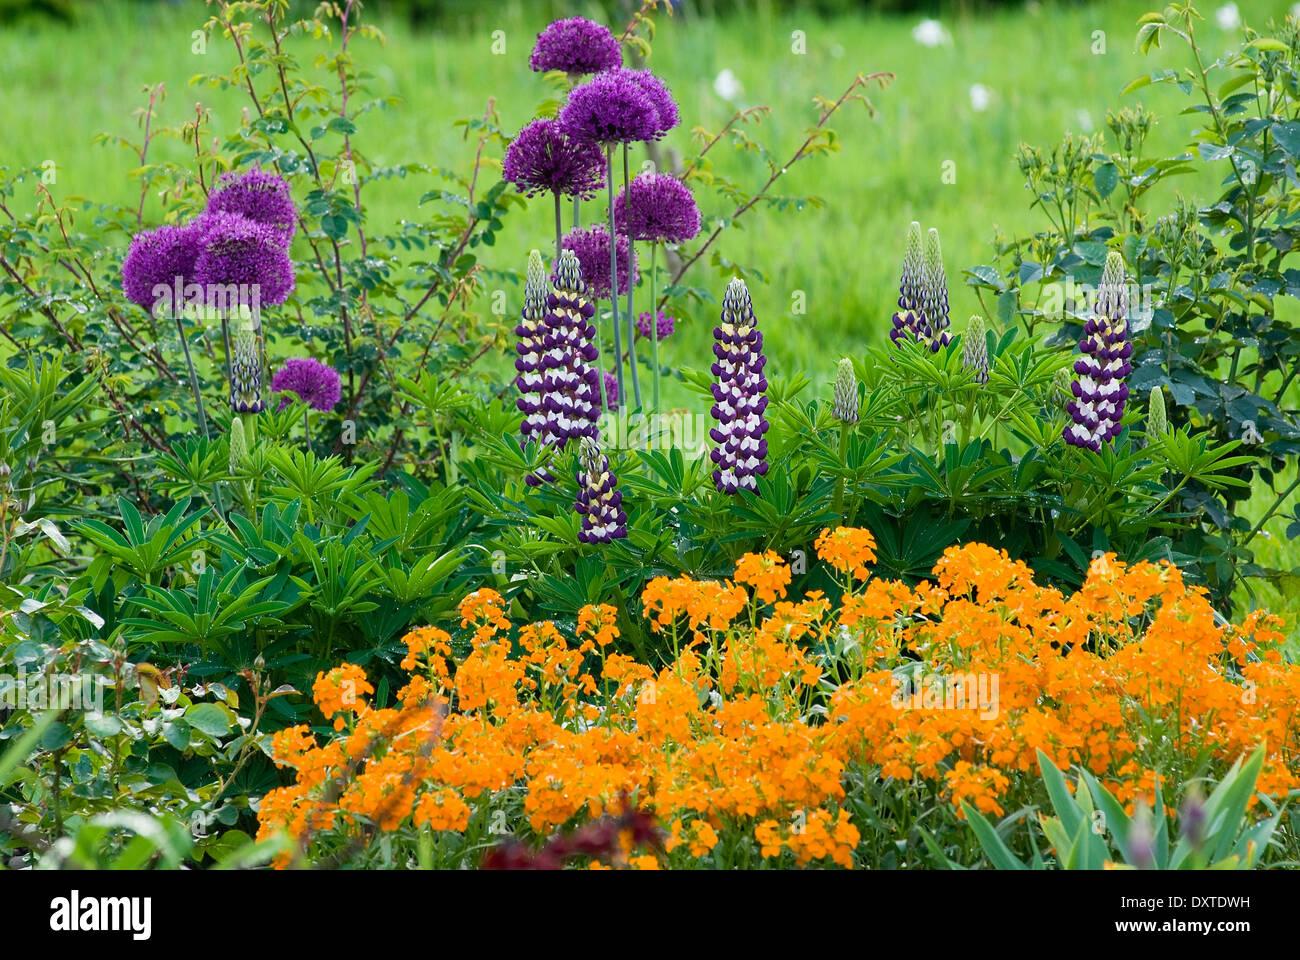 Frühlingsgrenze Stockfotos & Frühlingsgrenze Bilder